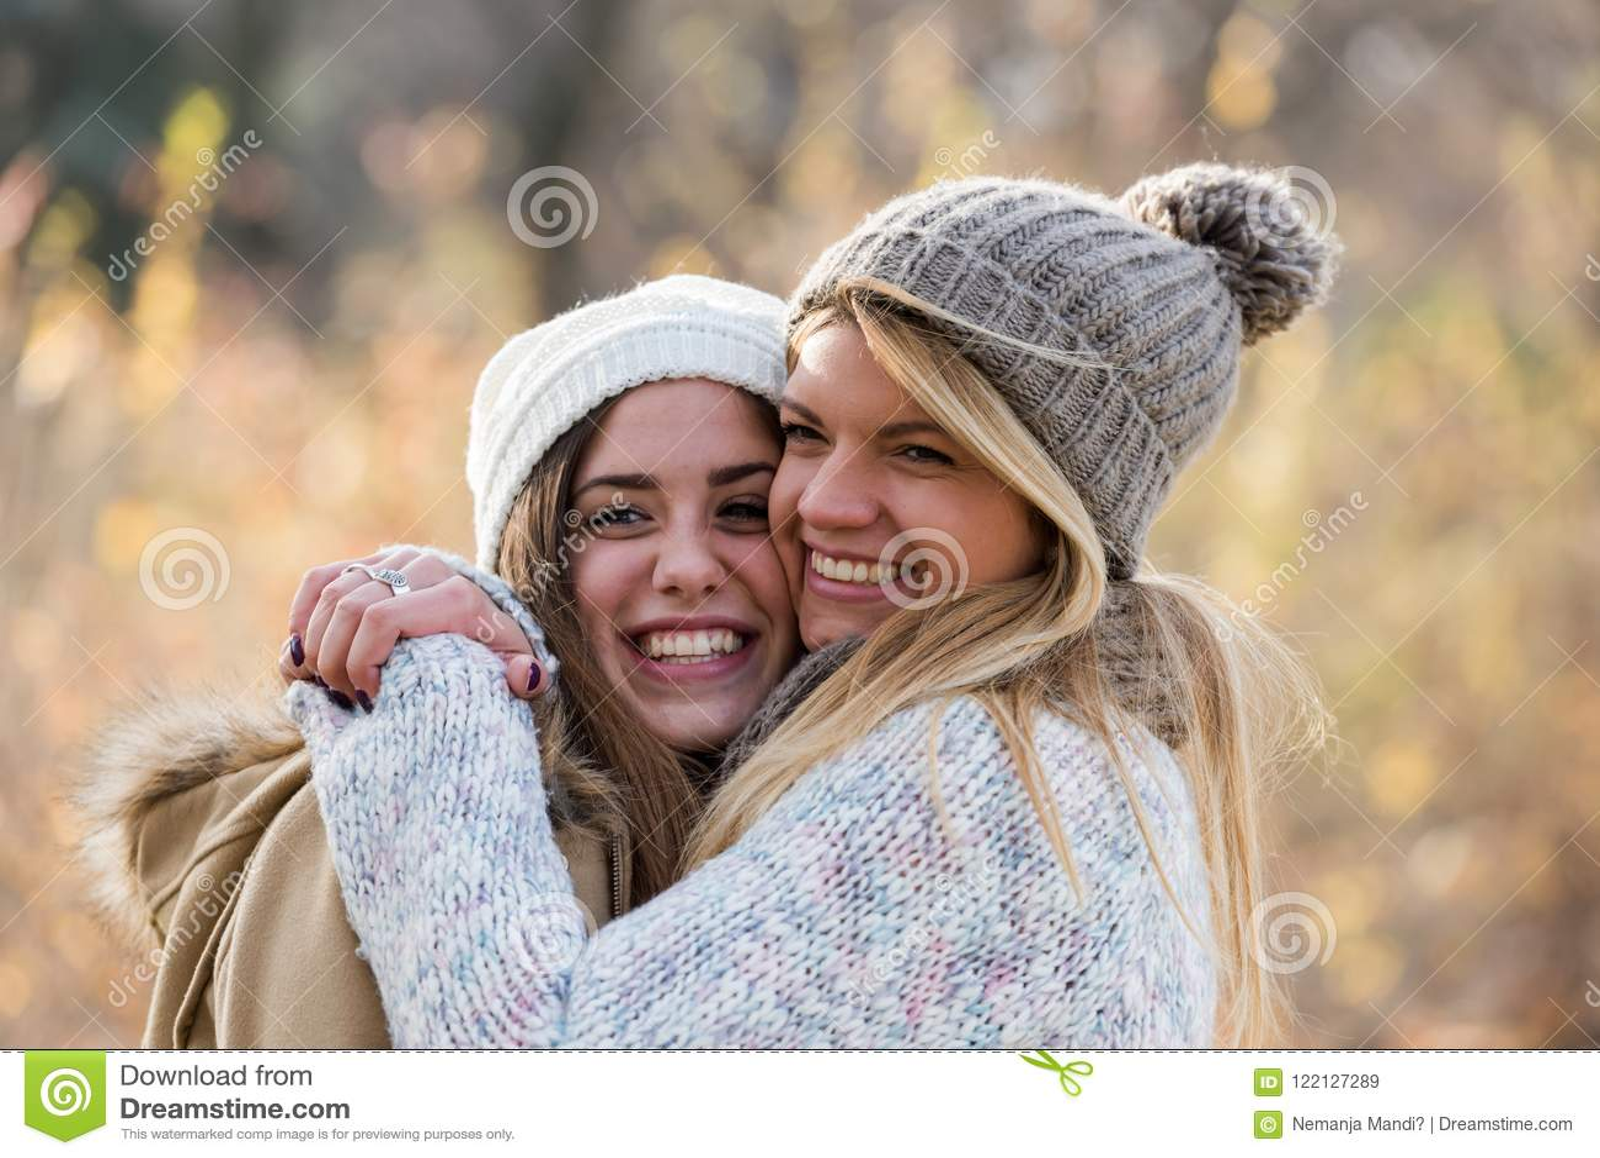 Two Beautiful Girls Hugging Friendship Stock Image Image Of Smiling Teenage 122127289